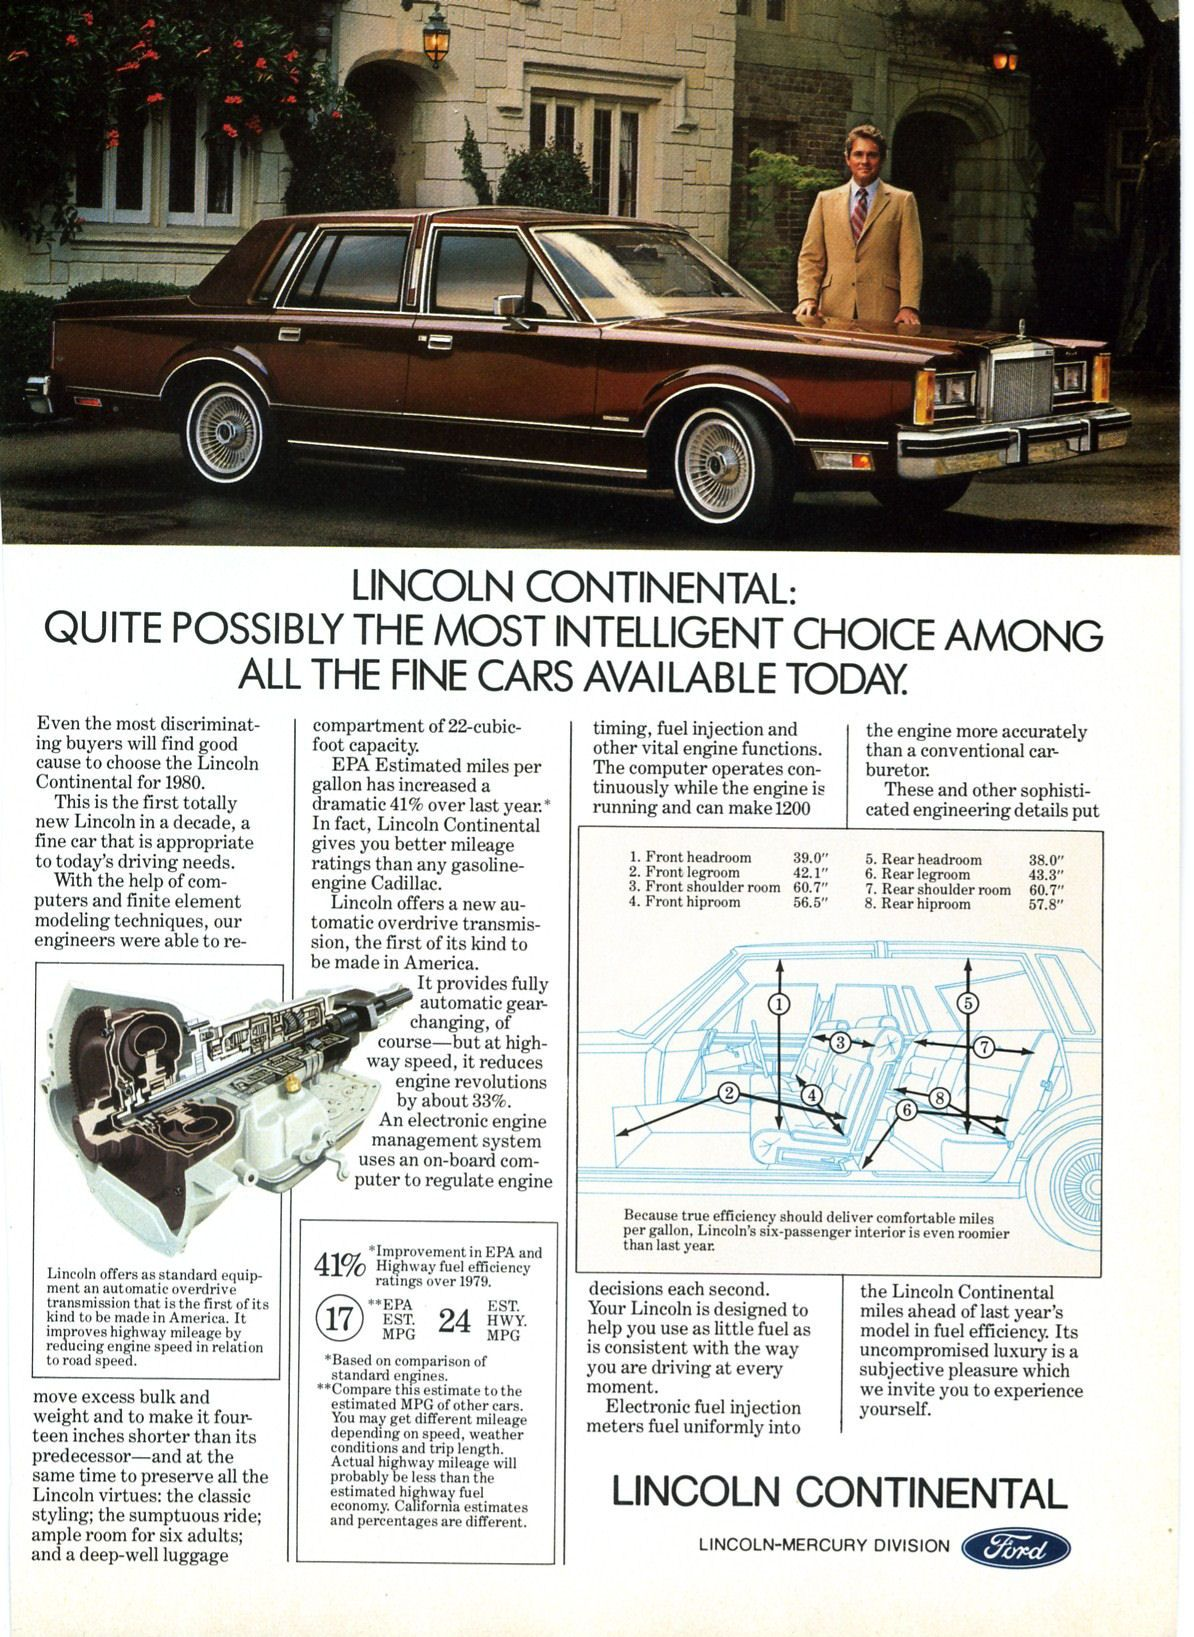 1980 Lincoln Continental Four Door Sedan Automobile